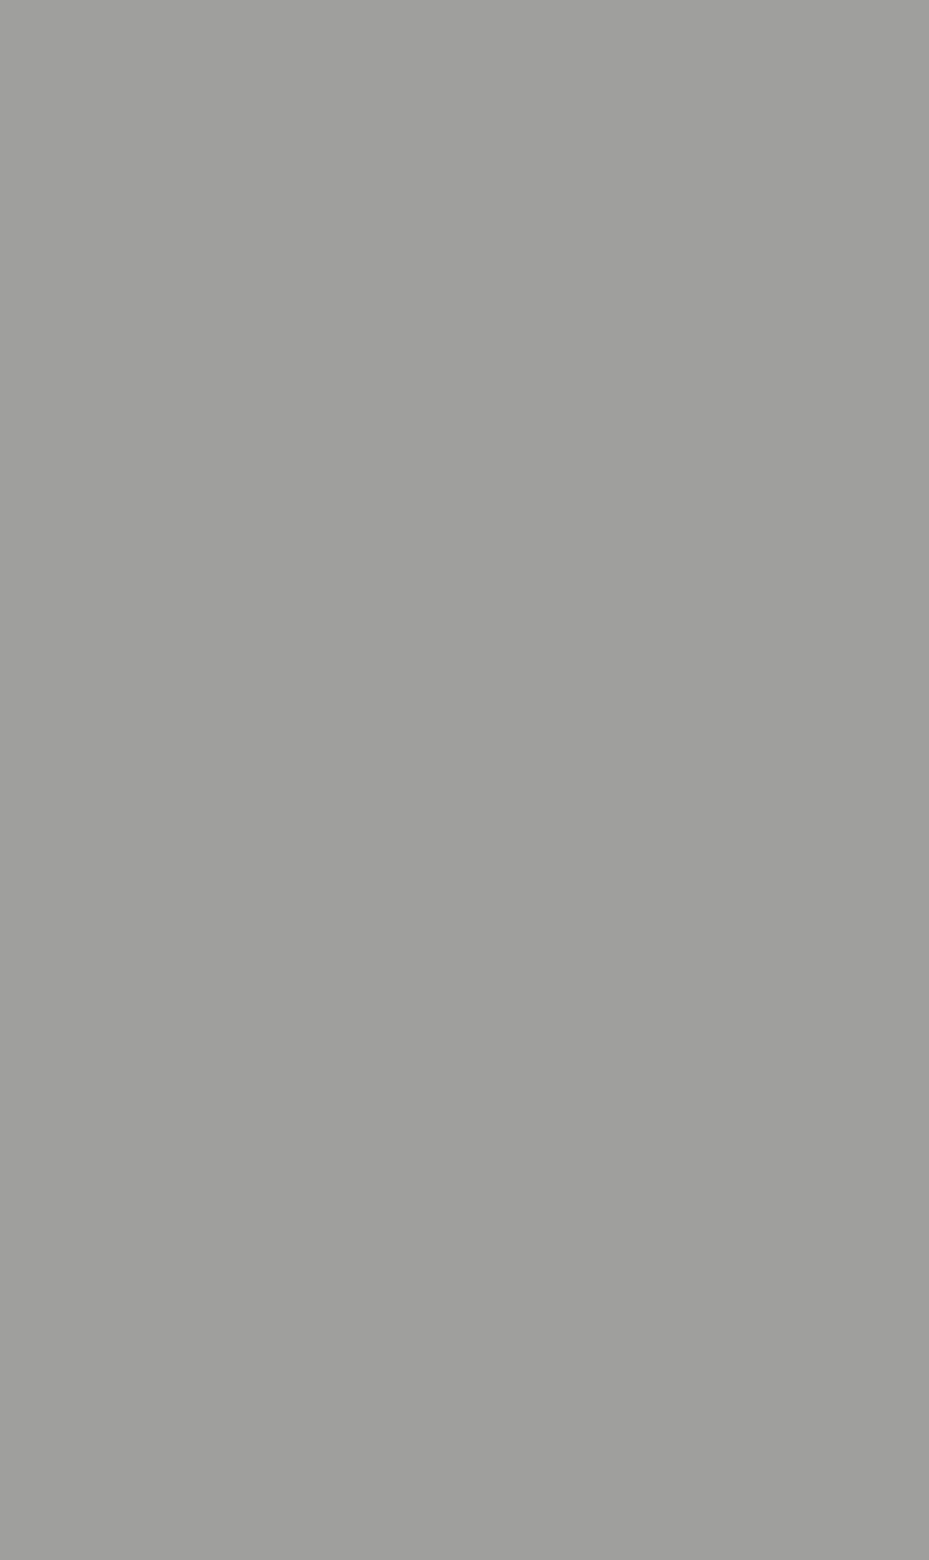 fondo gris-01.png